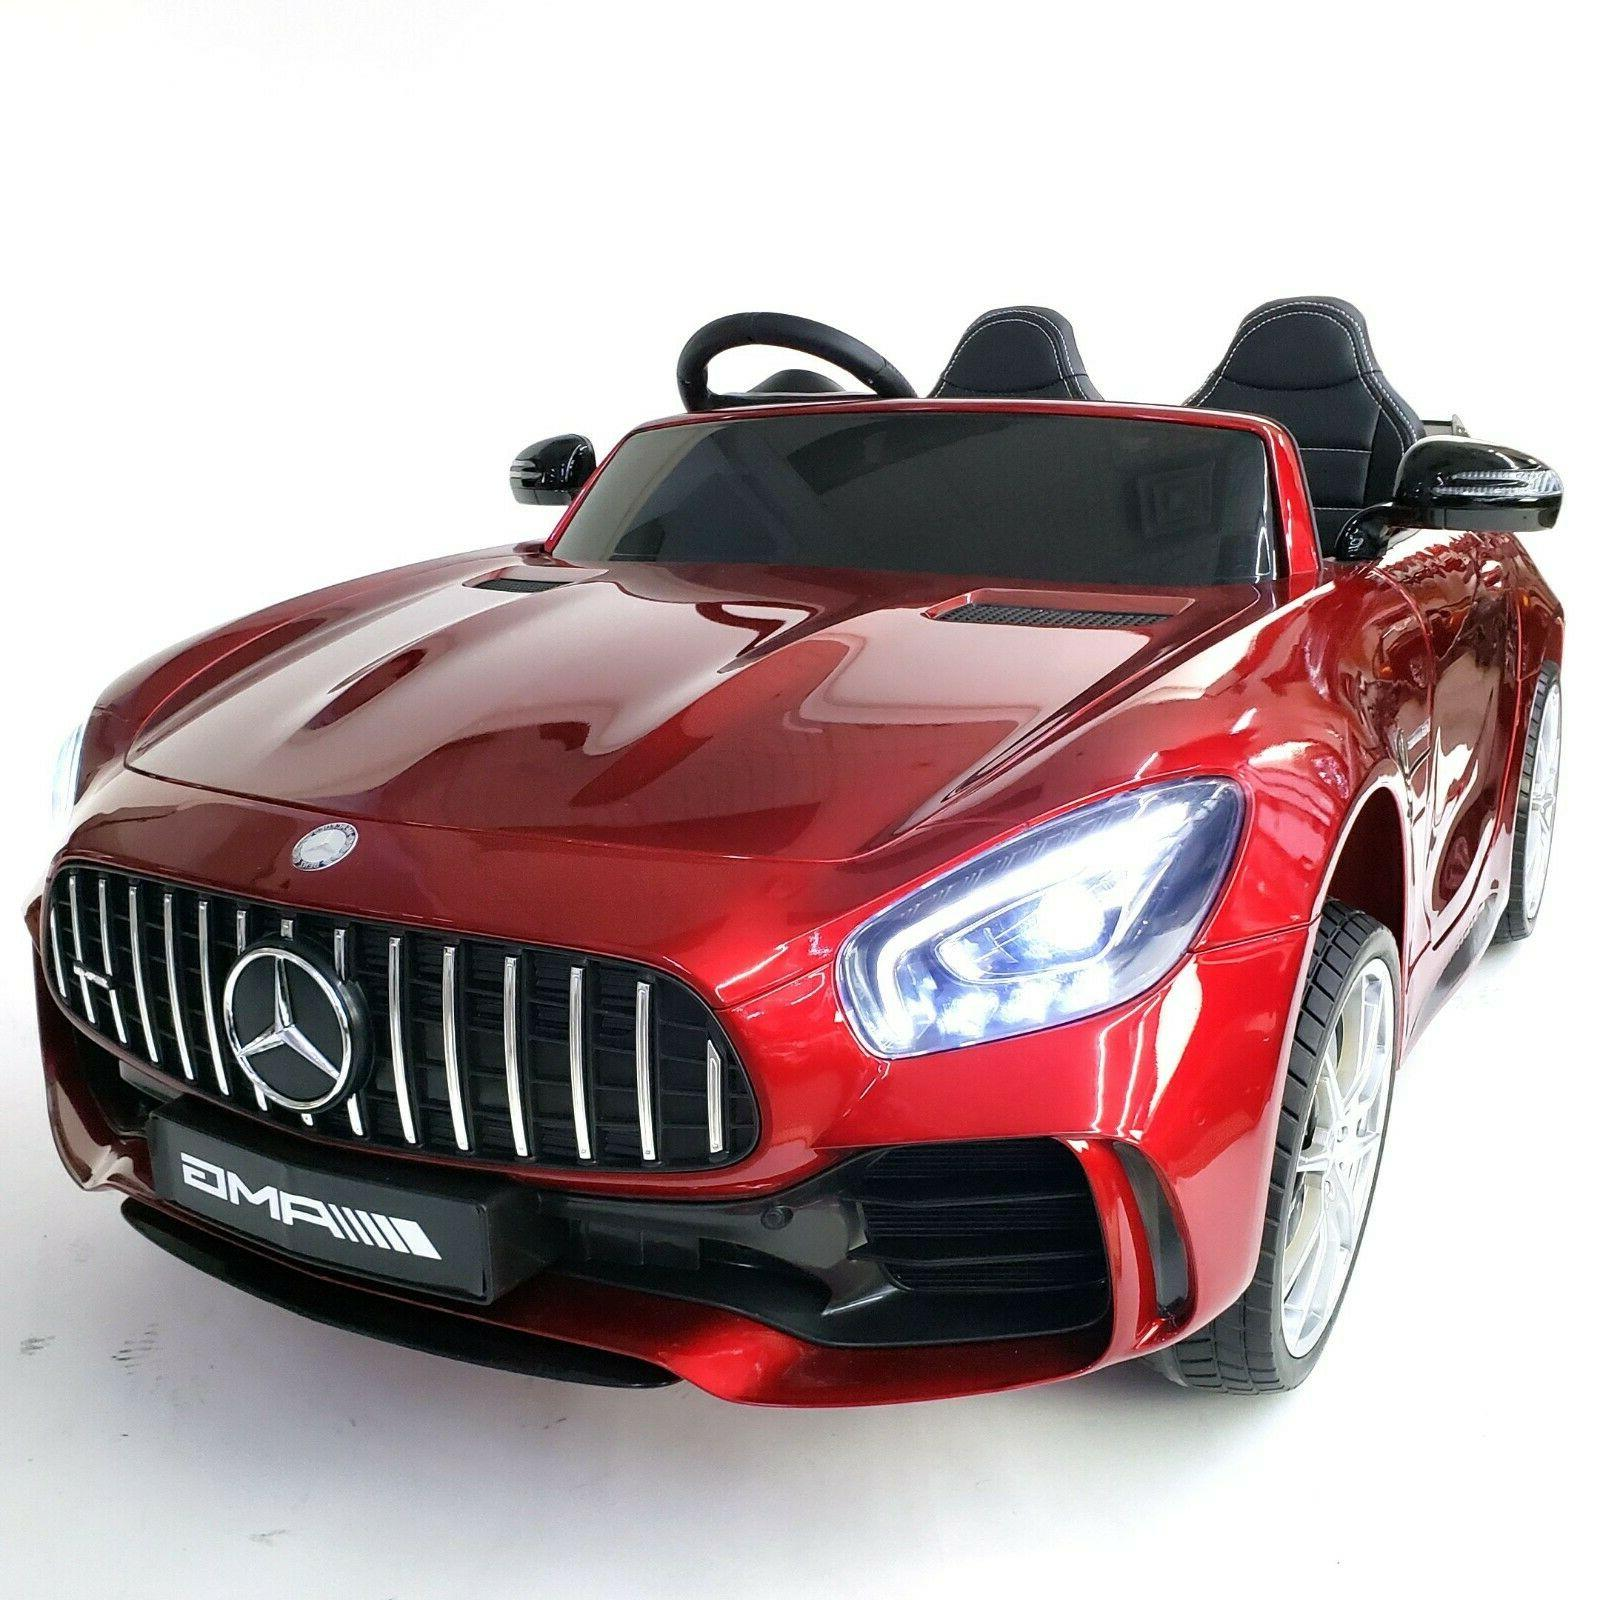 SUPER CAR KIDS ELECTRIC RIDE CAR 24VOLT WATT BRUSHLESS MOTOR